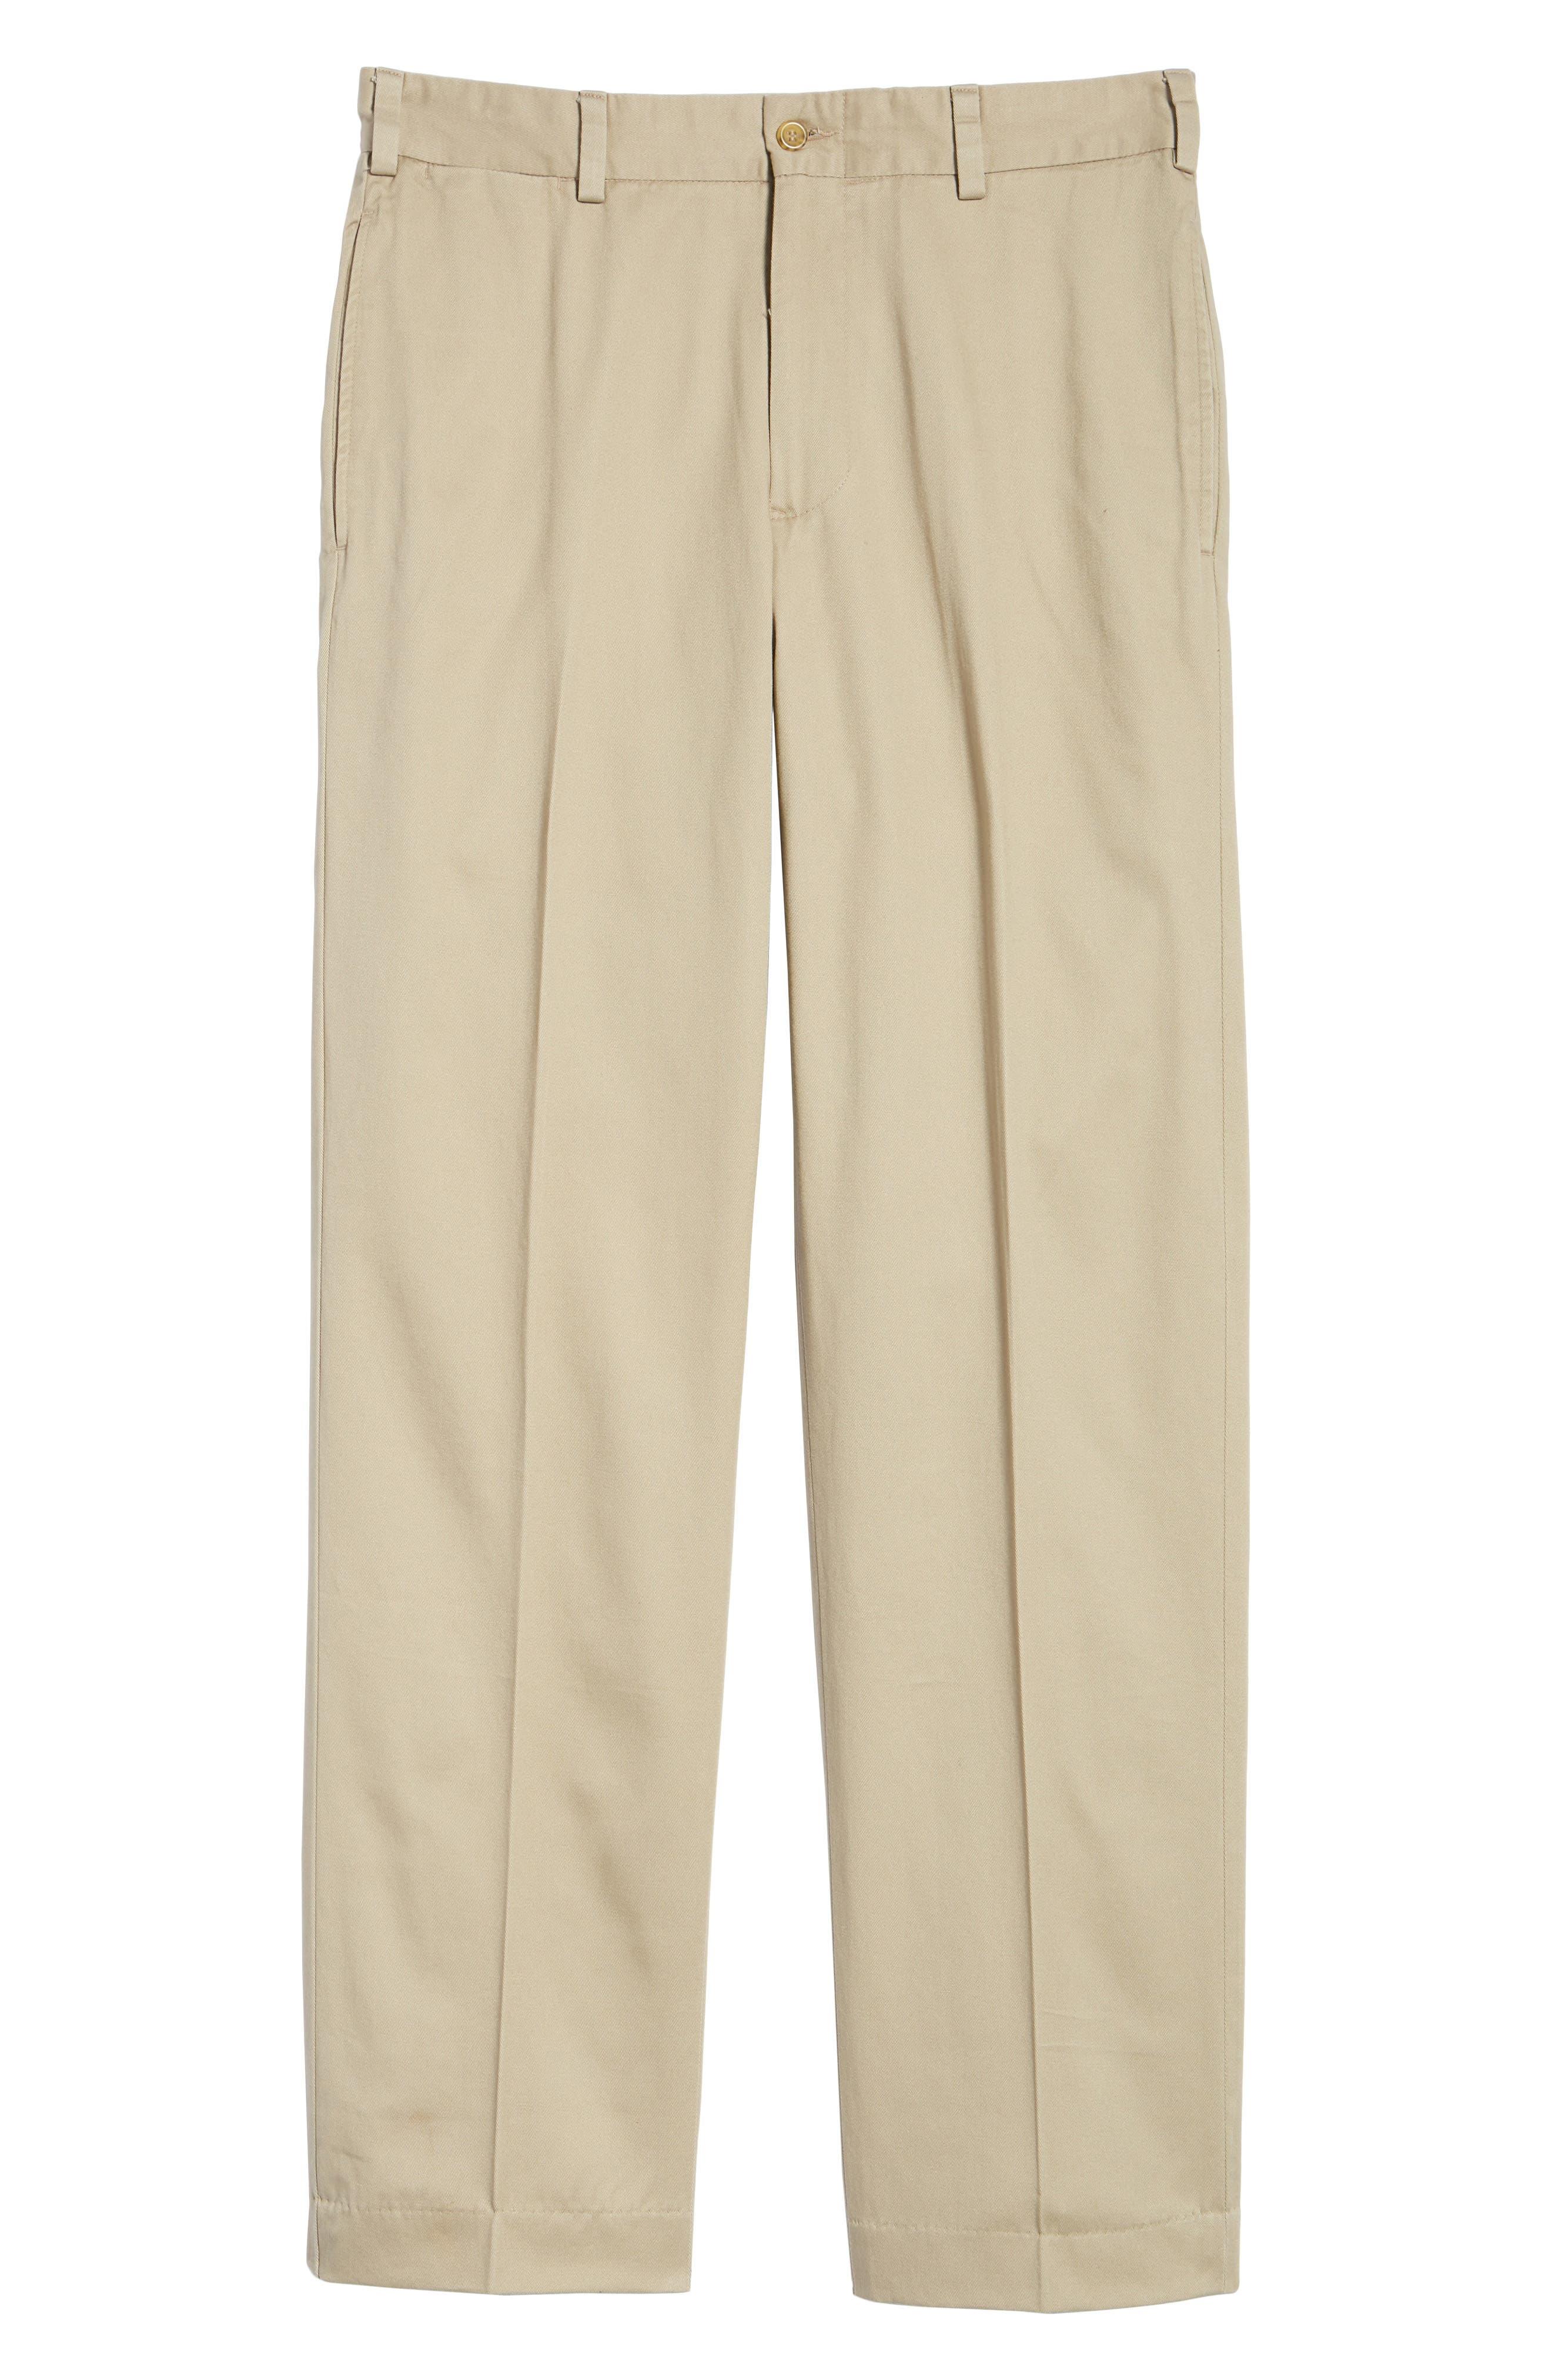 M2 Classic Fit Vintage Twill Flat Front Pants,                             Alternate thumbnail 6, color,                             Khaki